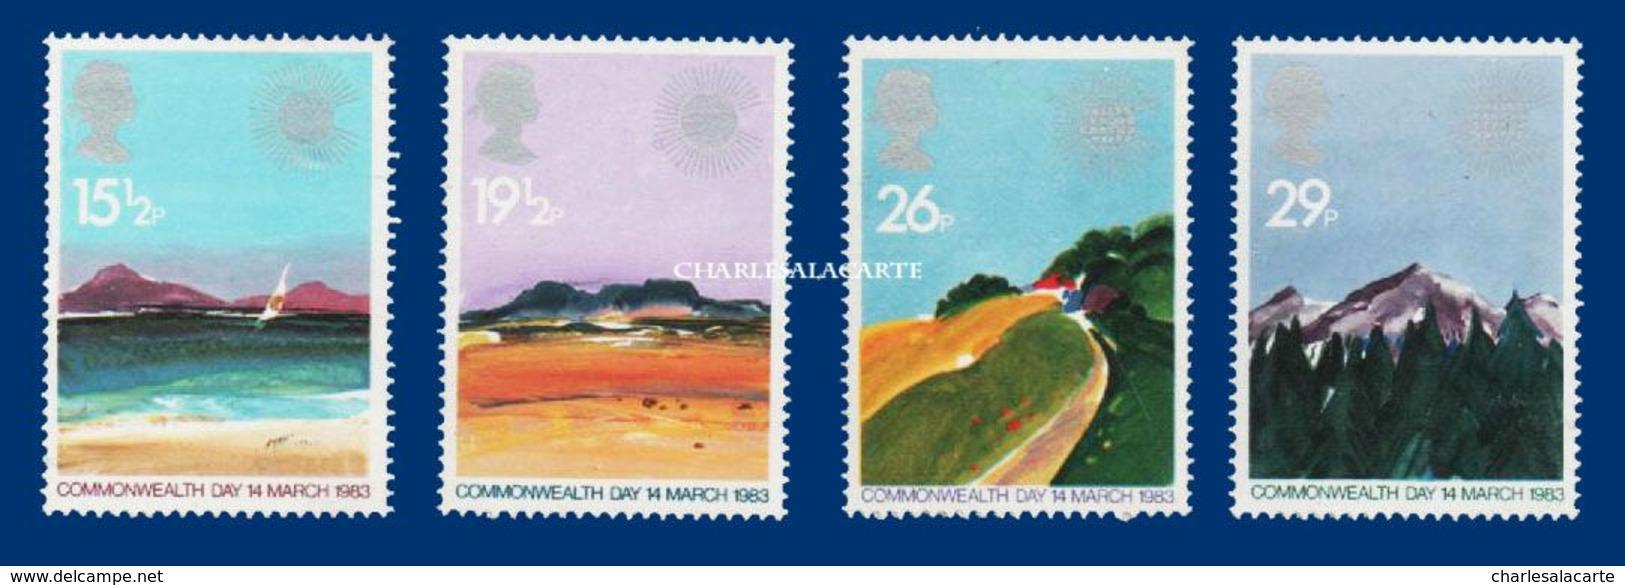 GREAT BRITAIN 1983  GEOGRAPHICAL REGIONS  U.M. S.G. 1211-1214    N.S.C. - Unused Stamps